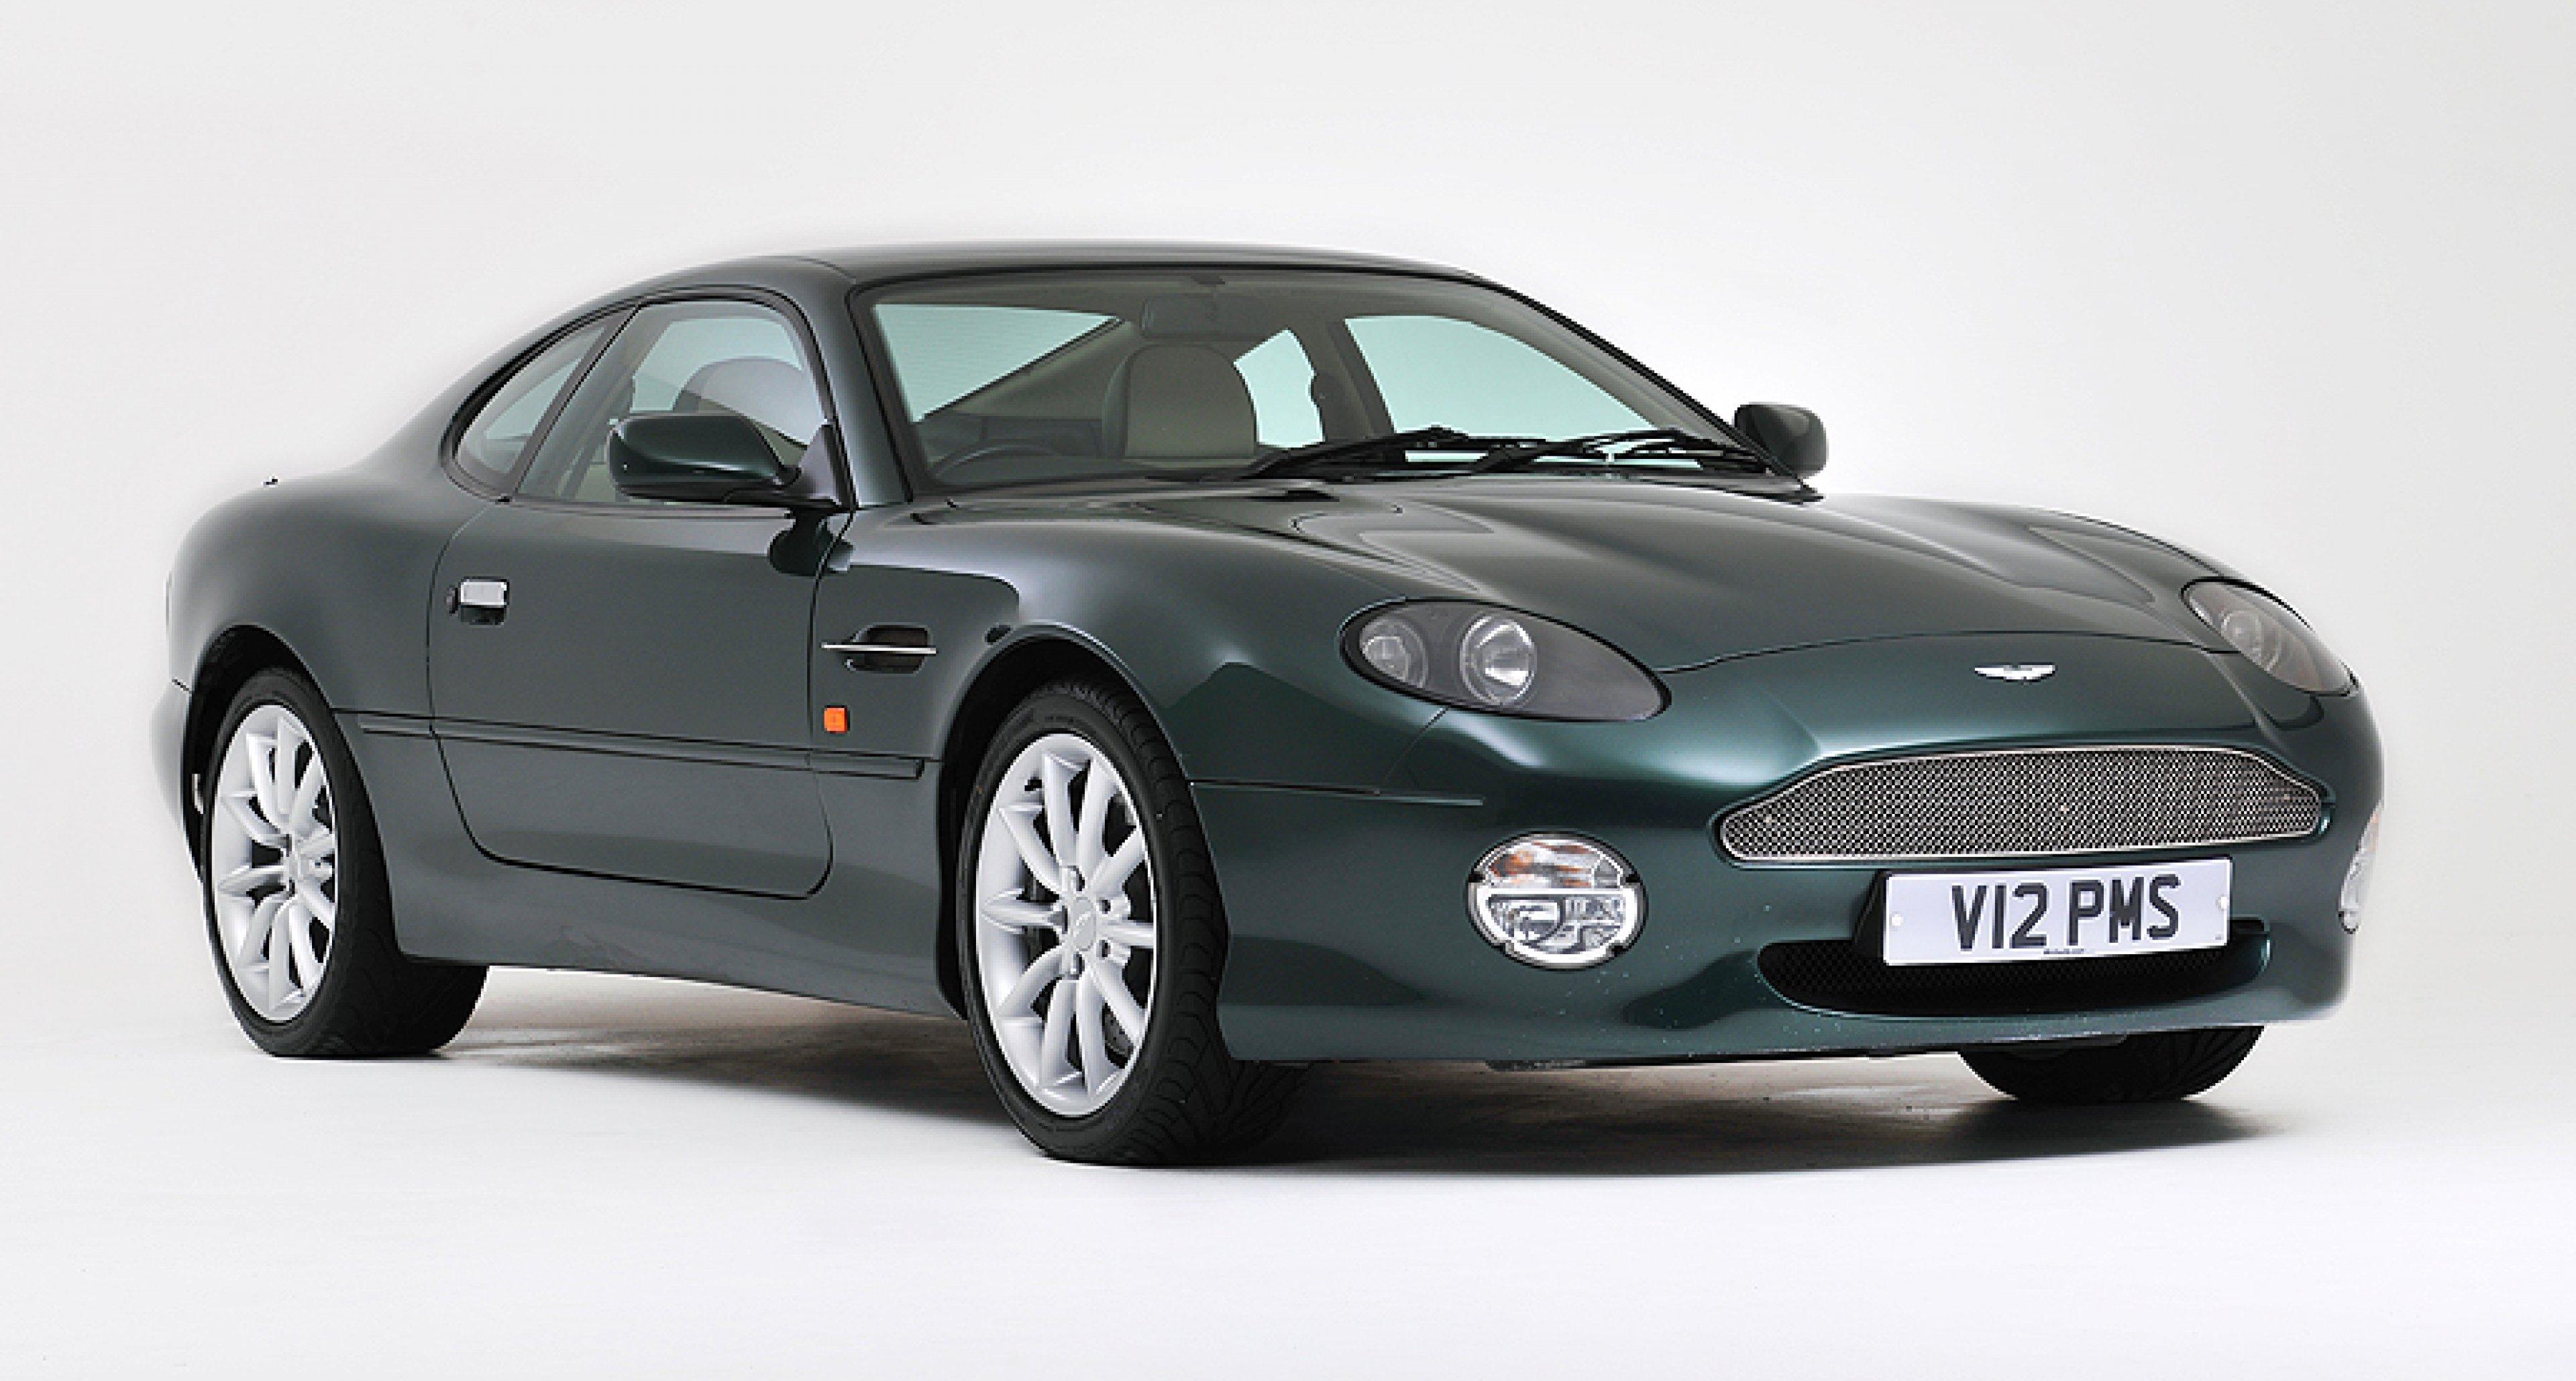 Aston Martin Db7 V12 Vantage Now You Re Talking Classic Driver Magazine